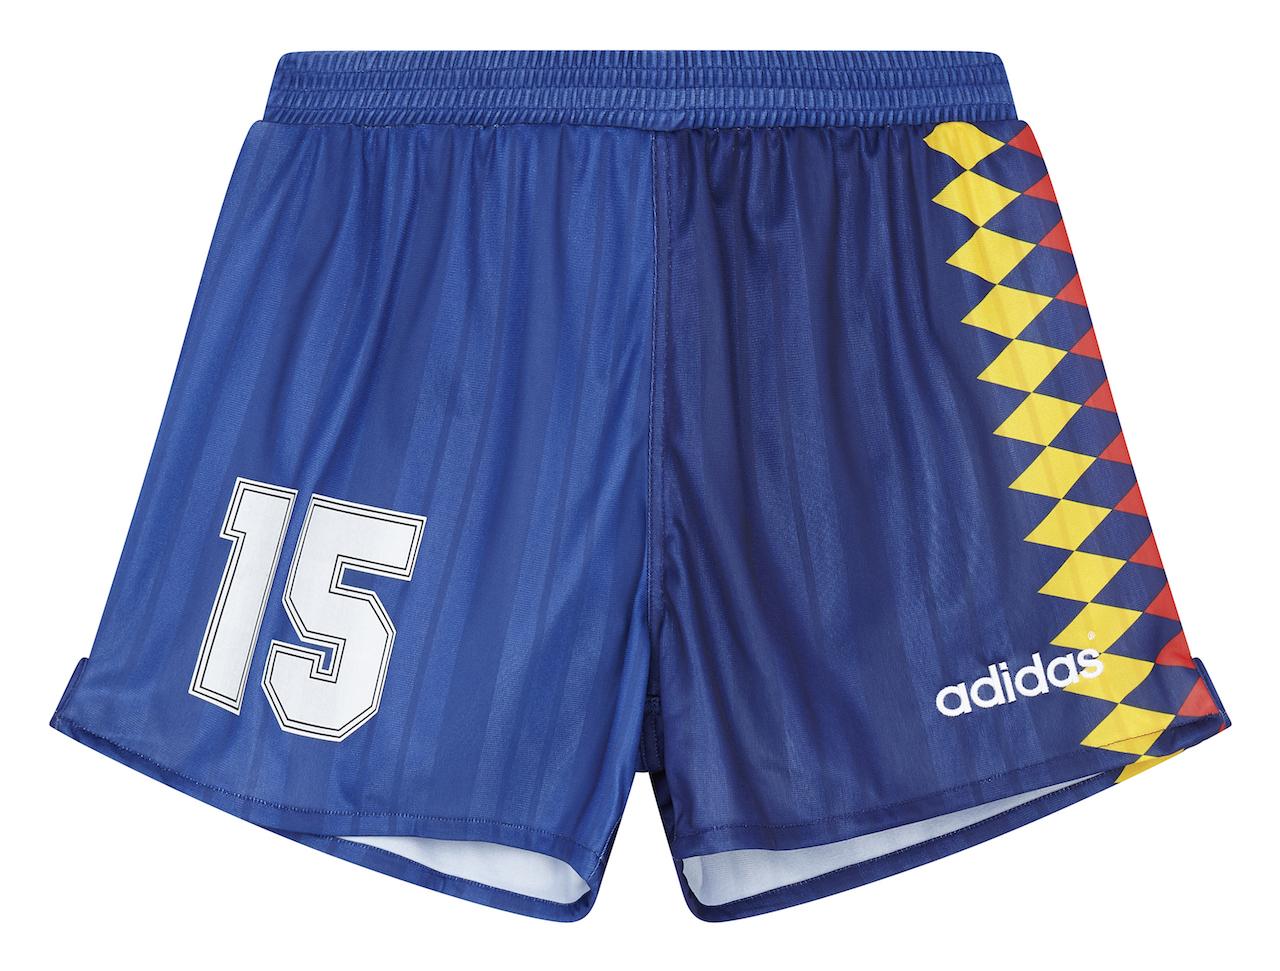 Introducing Adidas Originals Retro Football Collection